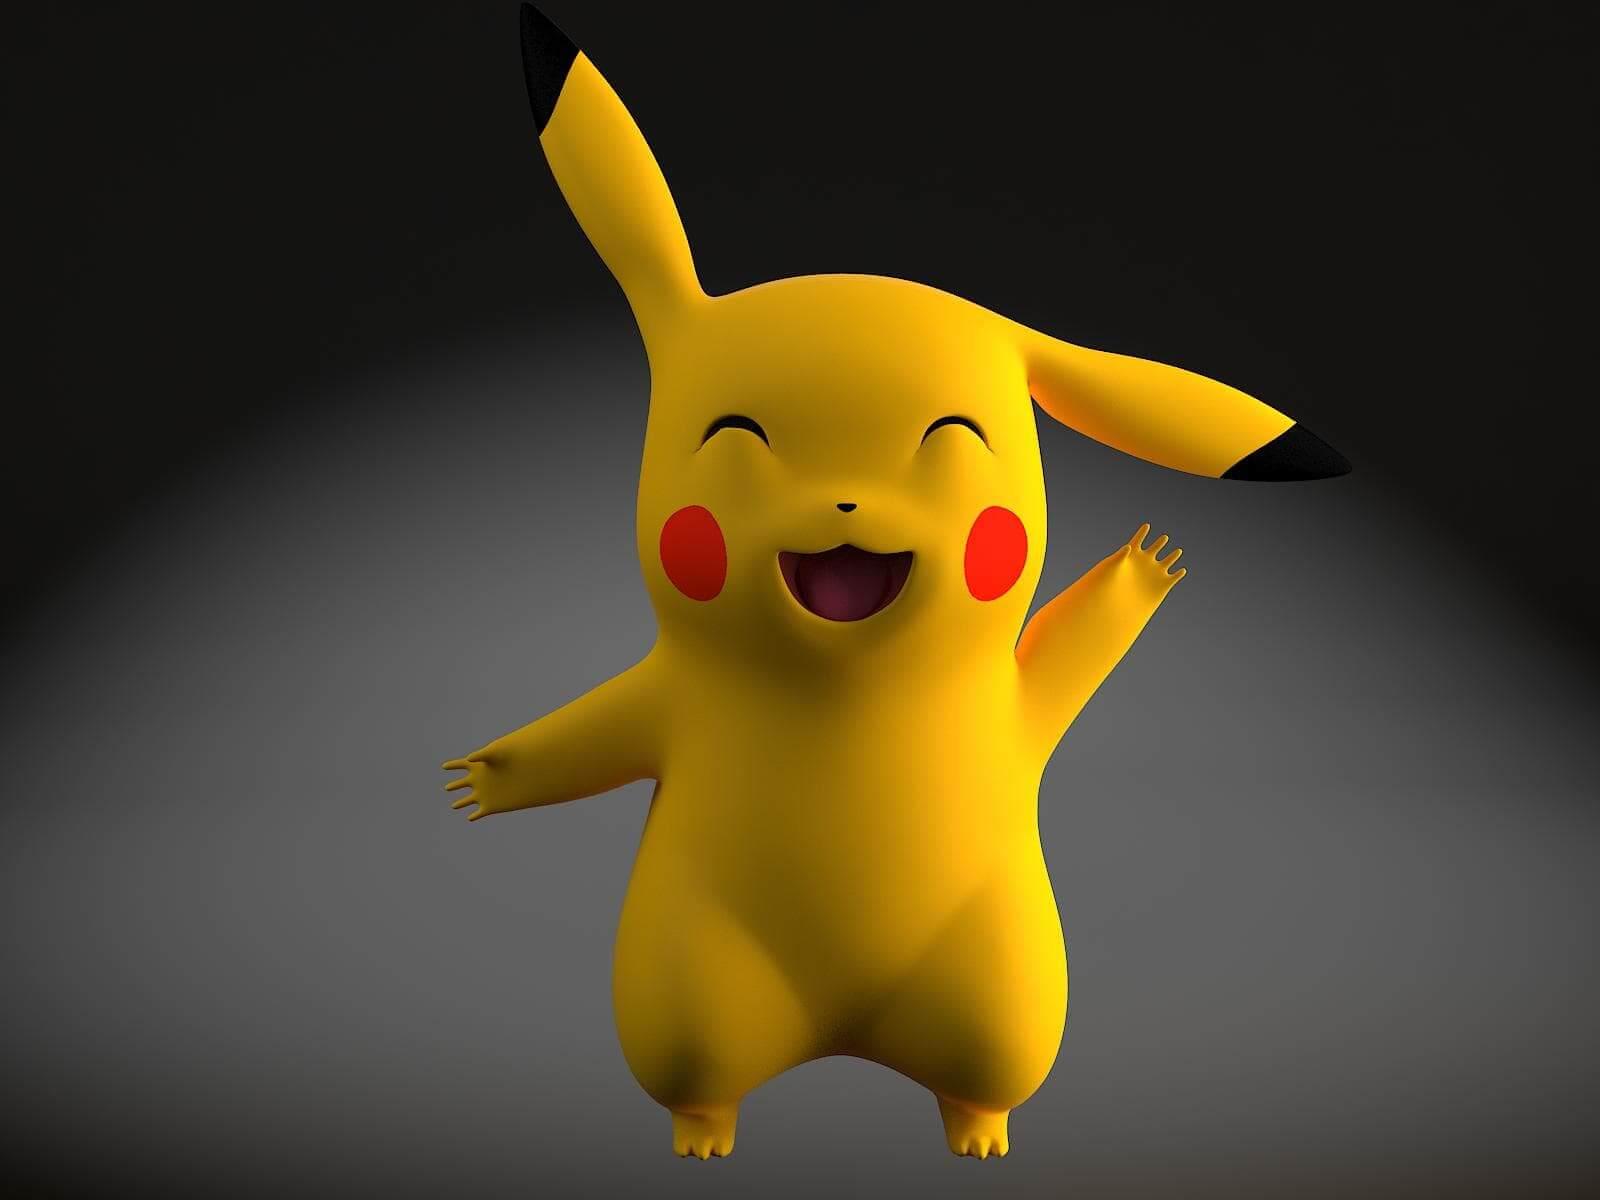 Pikachu Pokemon 3D Model